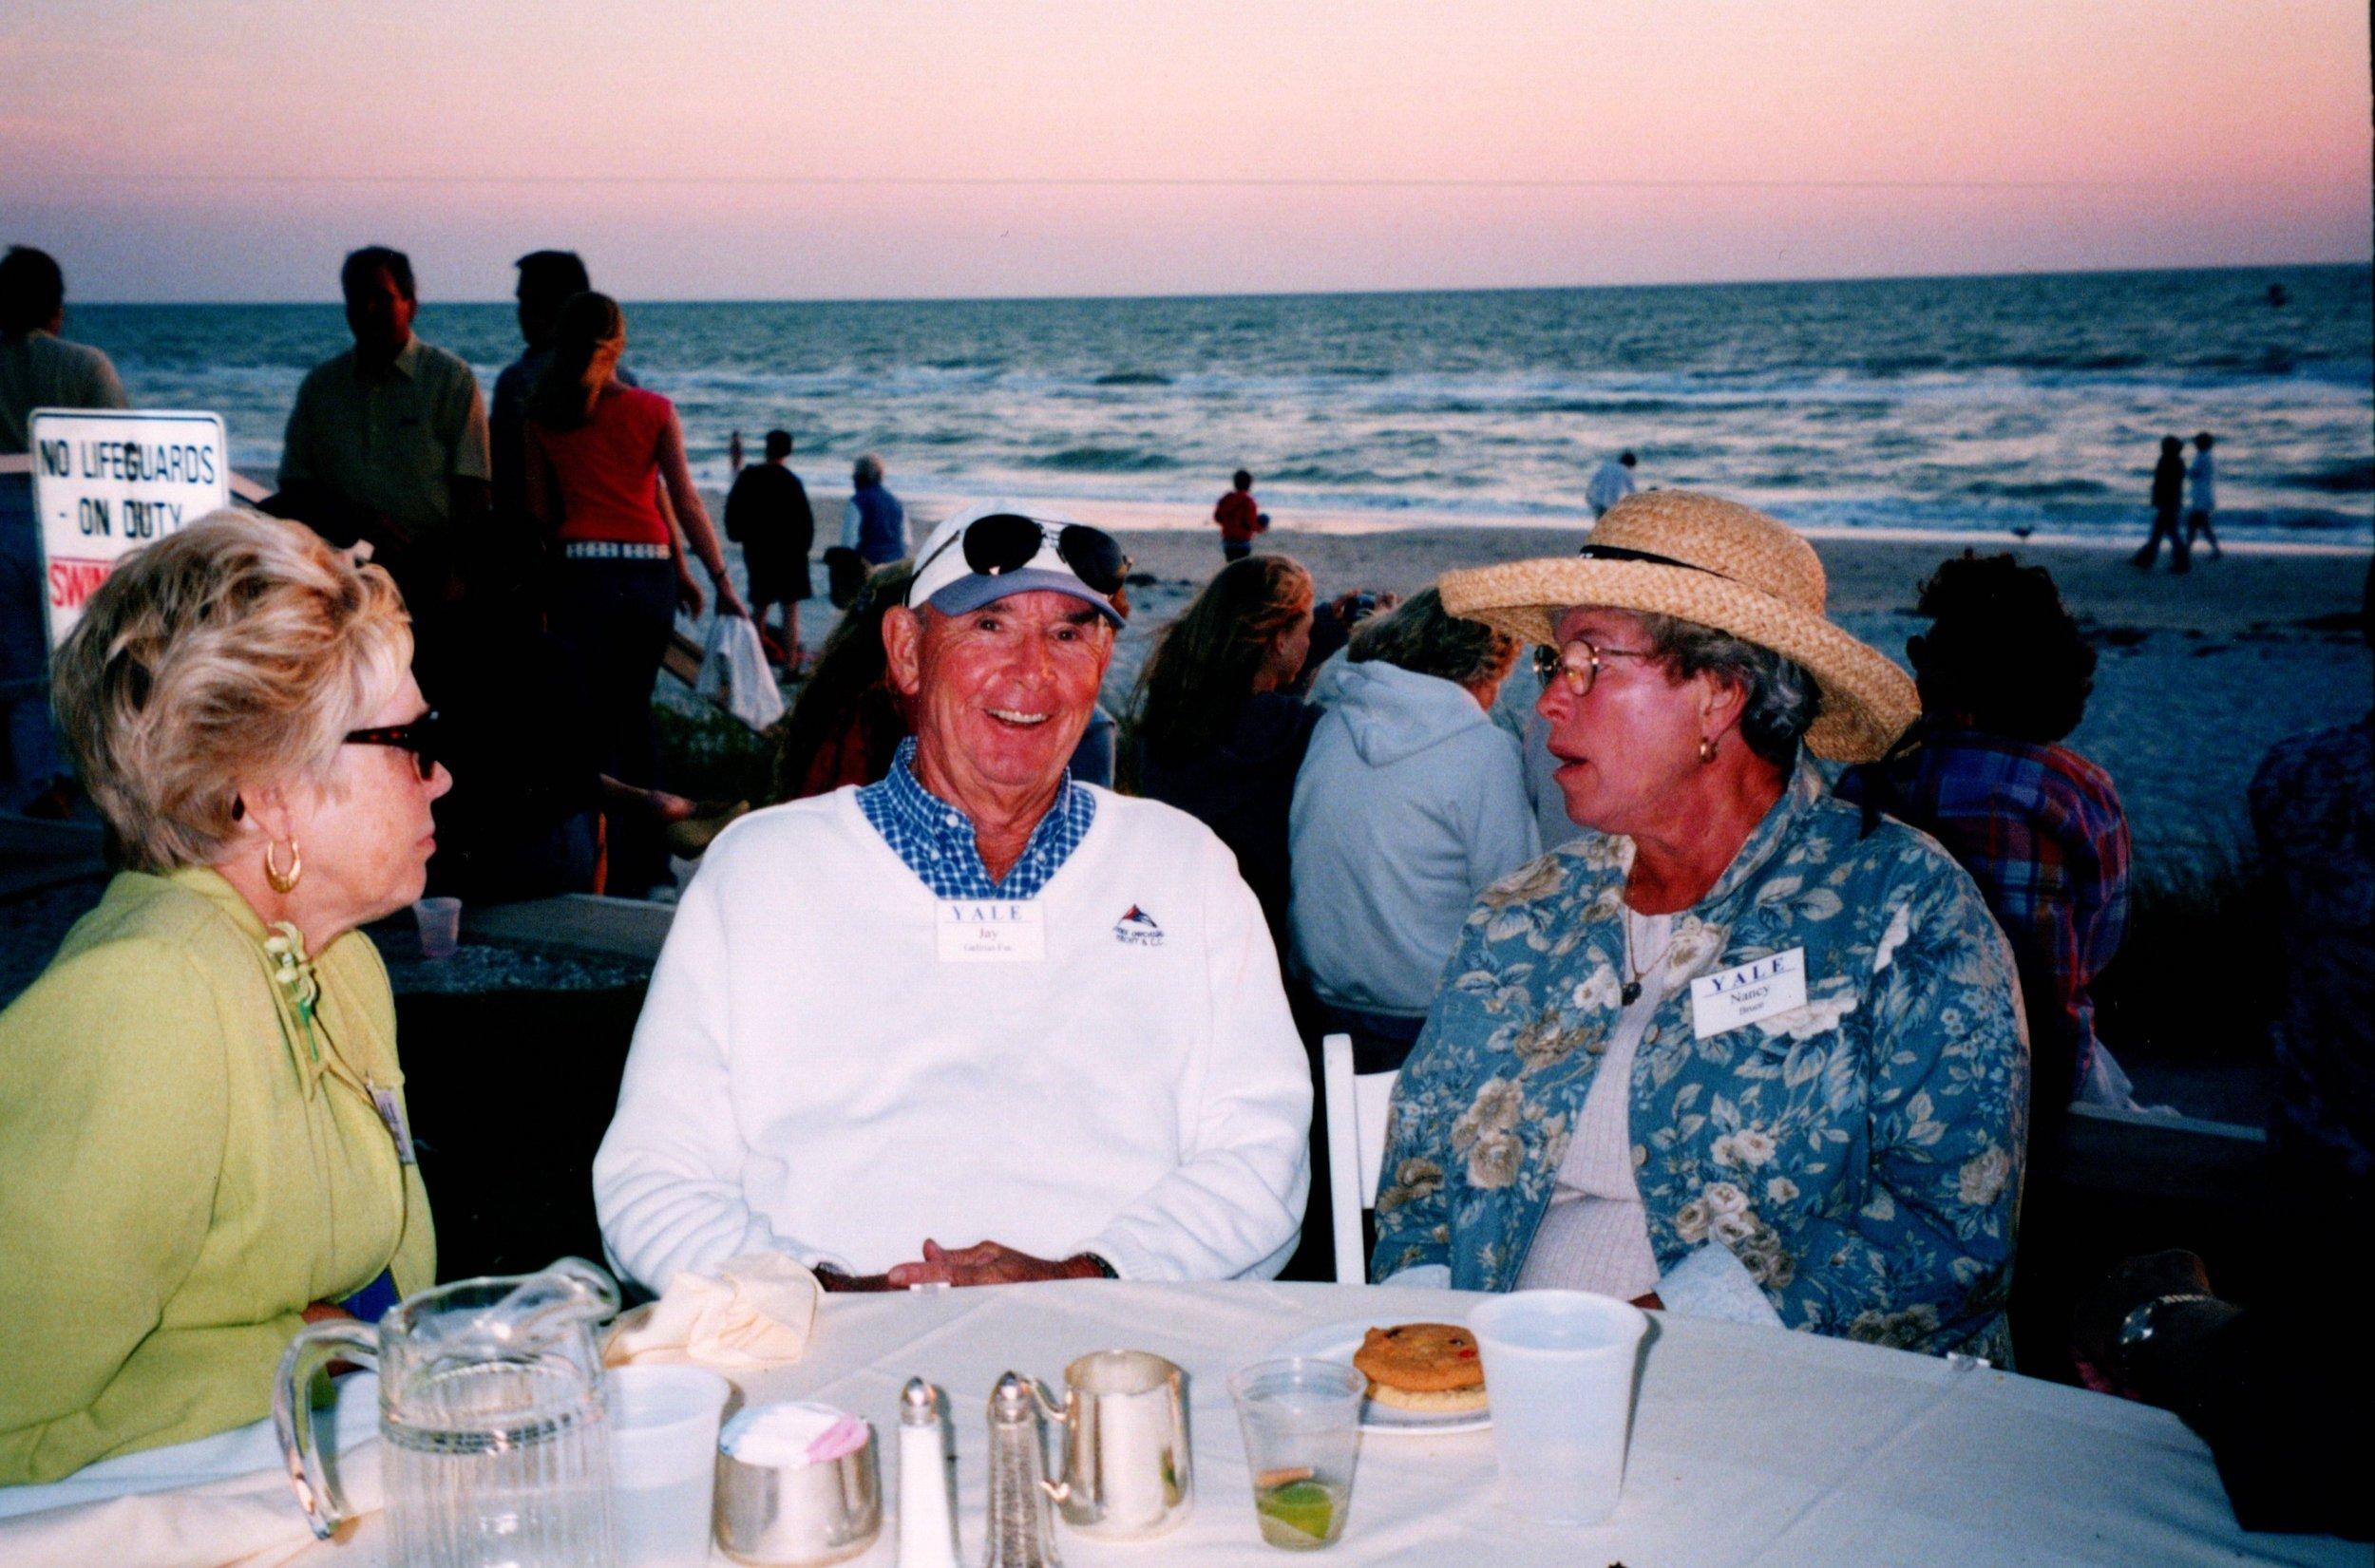 4_ 4_2004 - IVY LEAGUE PICNIC - NAPLES BEACH HOTEL 8.jpg